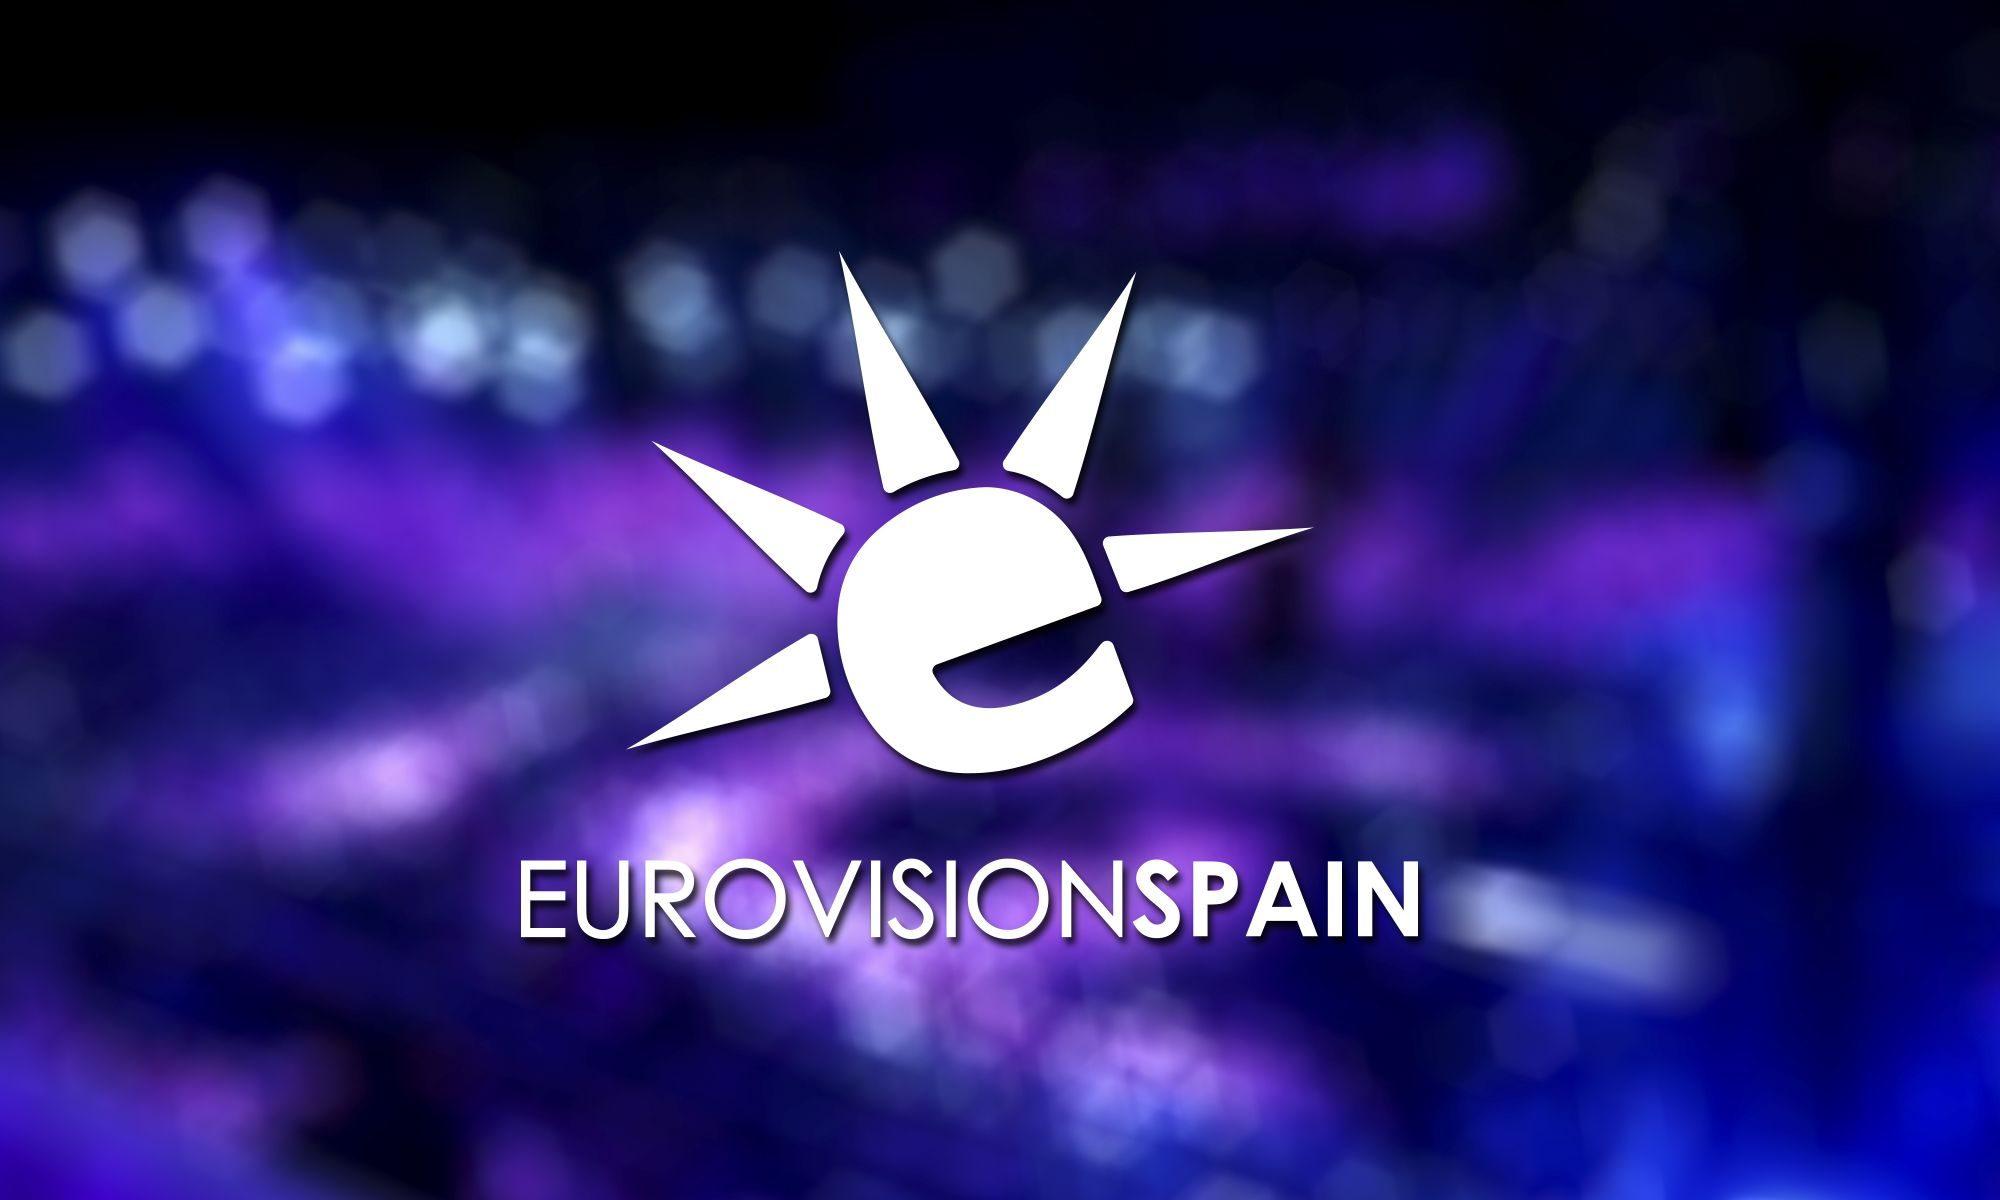 sin_ano_30122014_033432_logo_eurovisionspain_grande-3